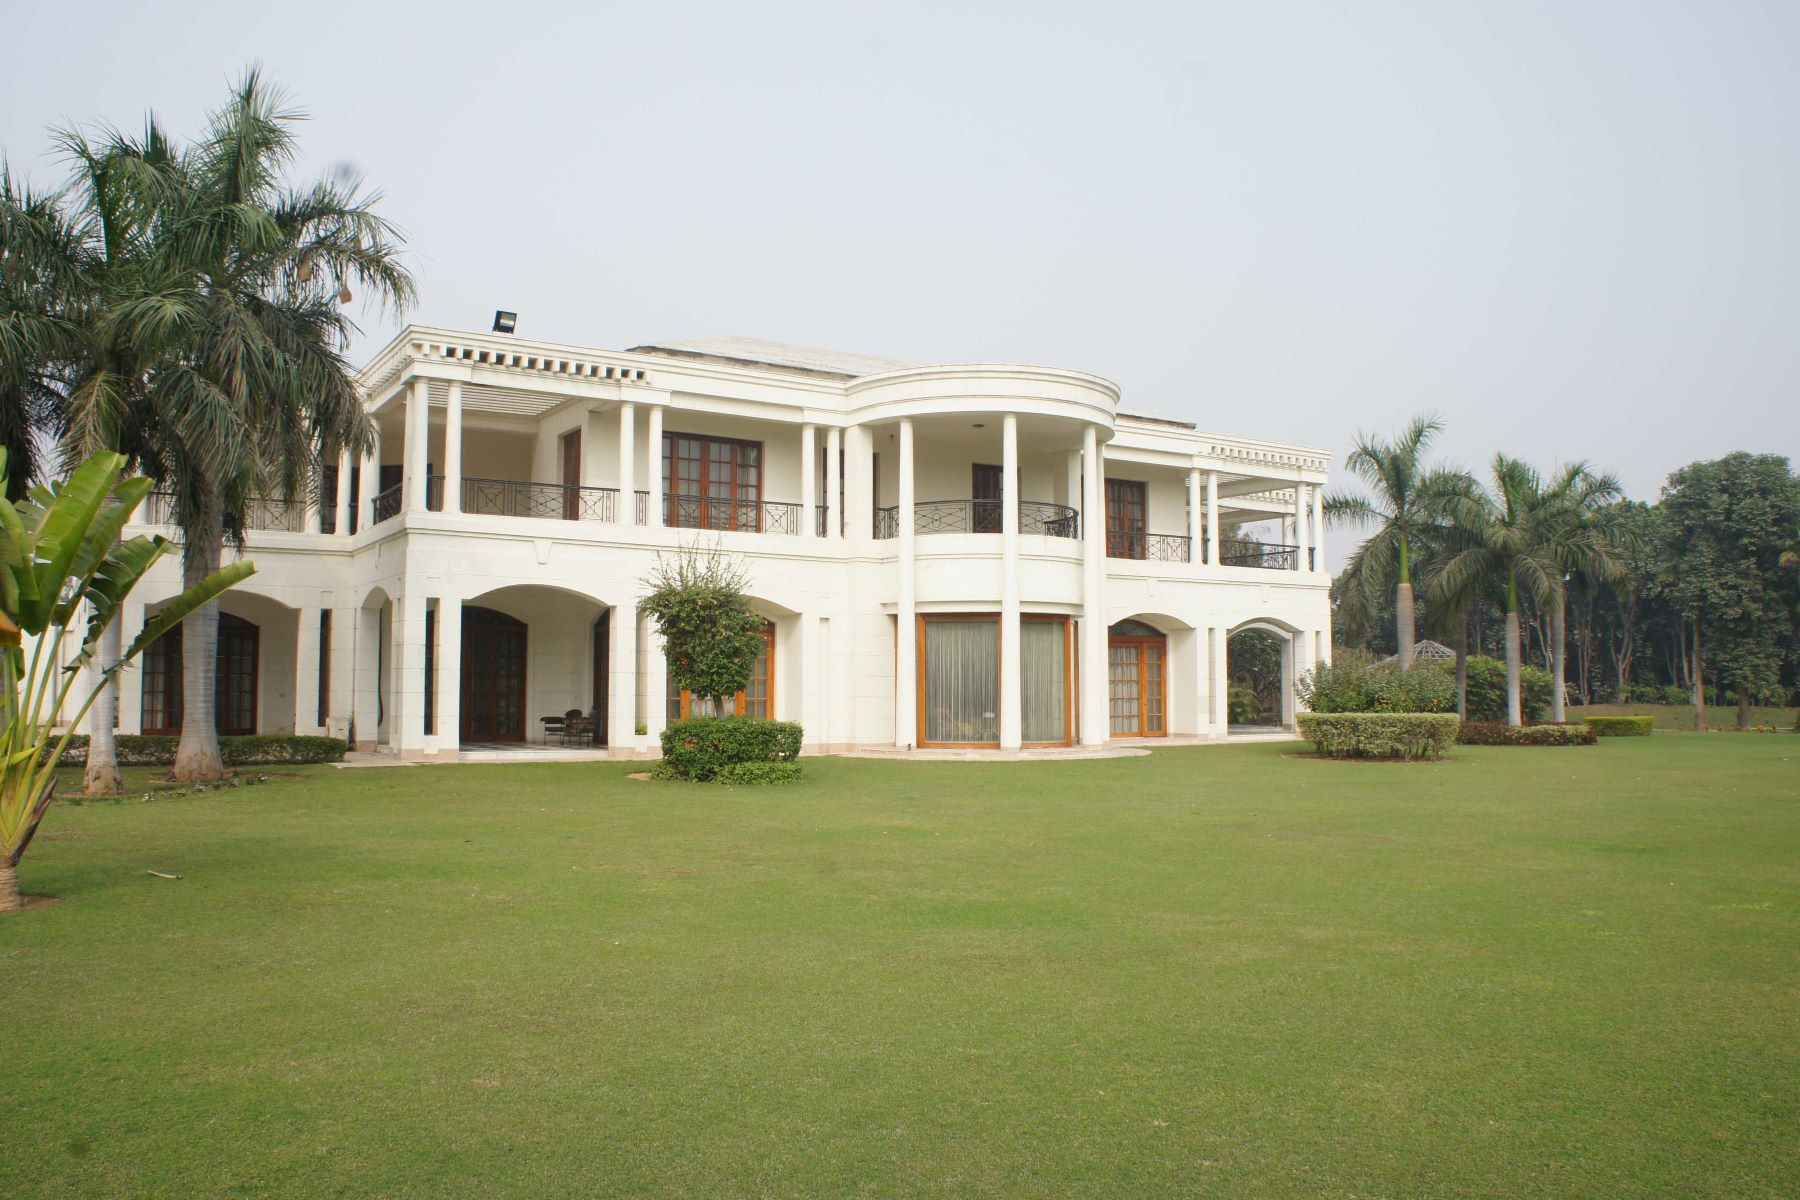 Farm / Ranch / Plantation for Sale at Farmhouse in Westend Greens West End Green, Shivji Marg New Delhi, Delhi, 110038 India